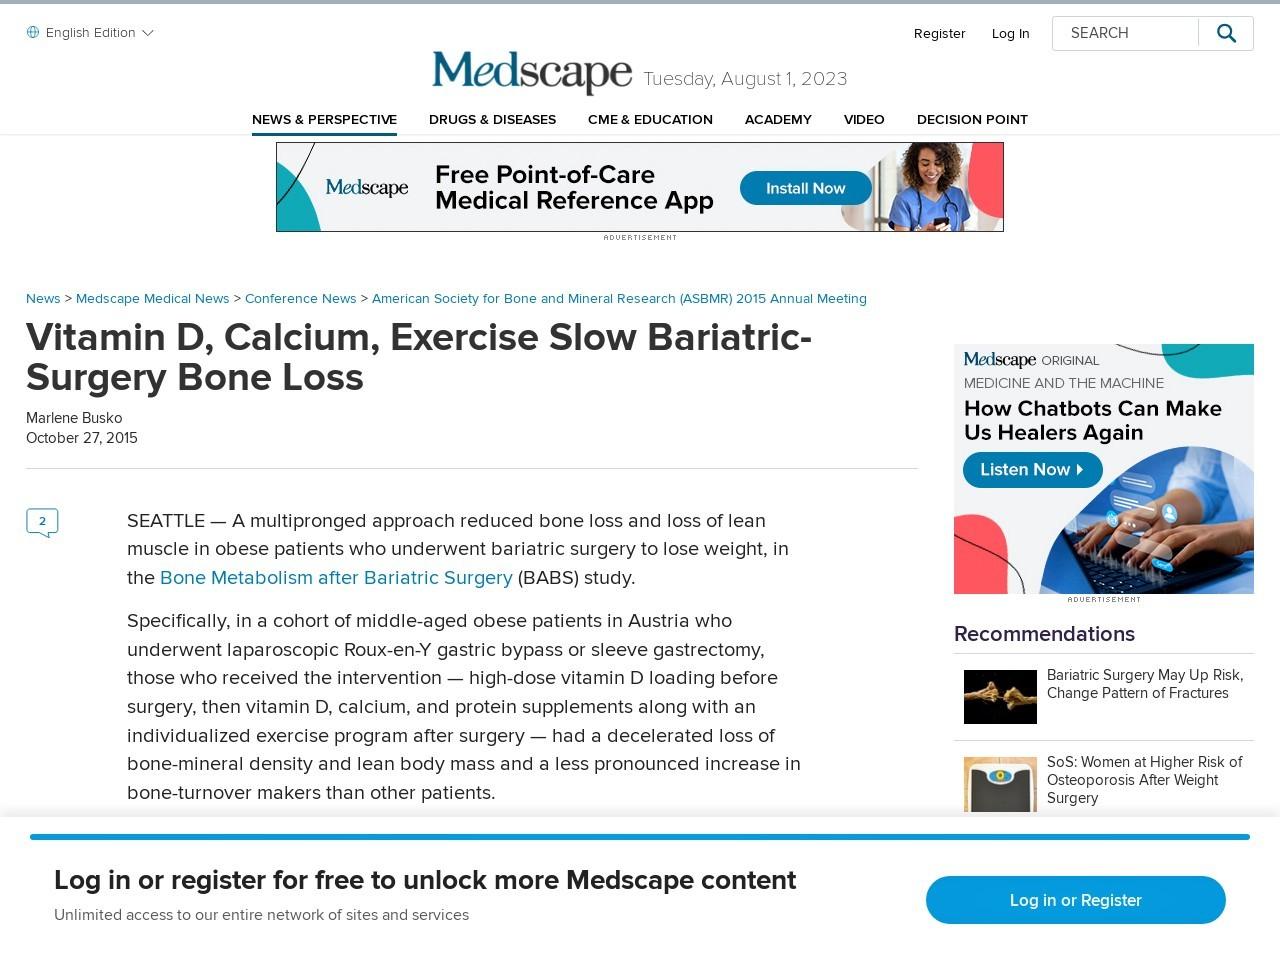 Vitamin D, Calcium, Exercise Slow Bariatric-Surgery Bone Loss